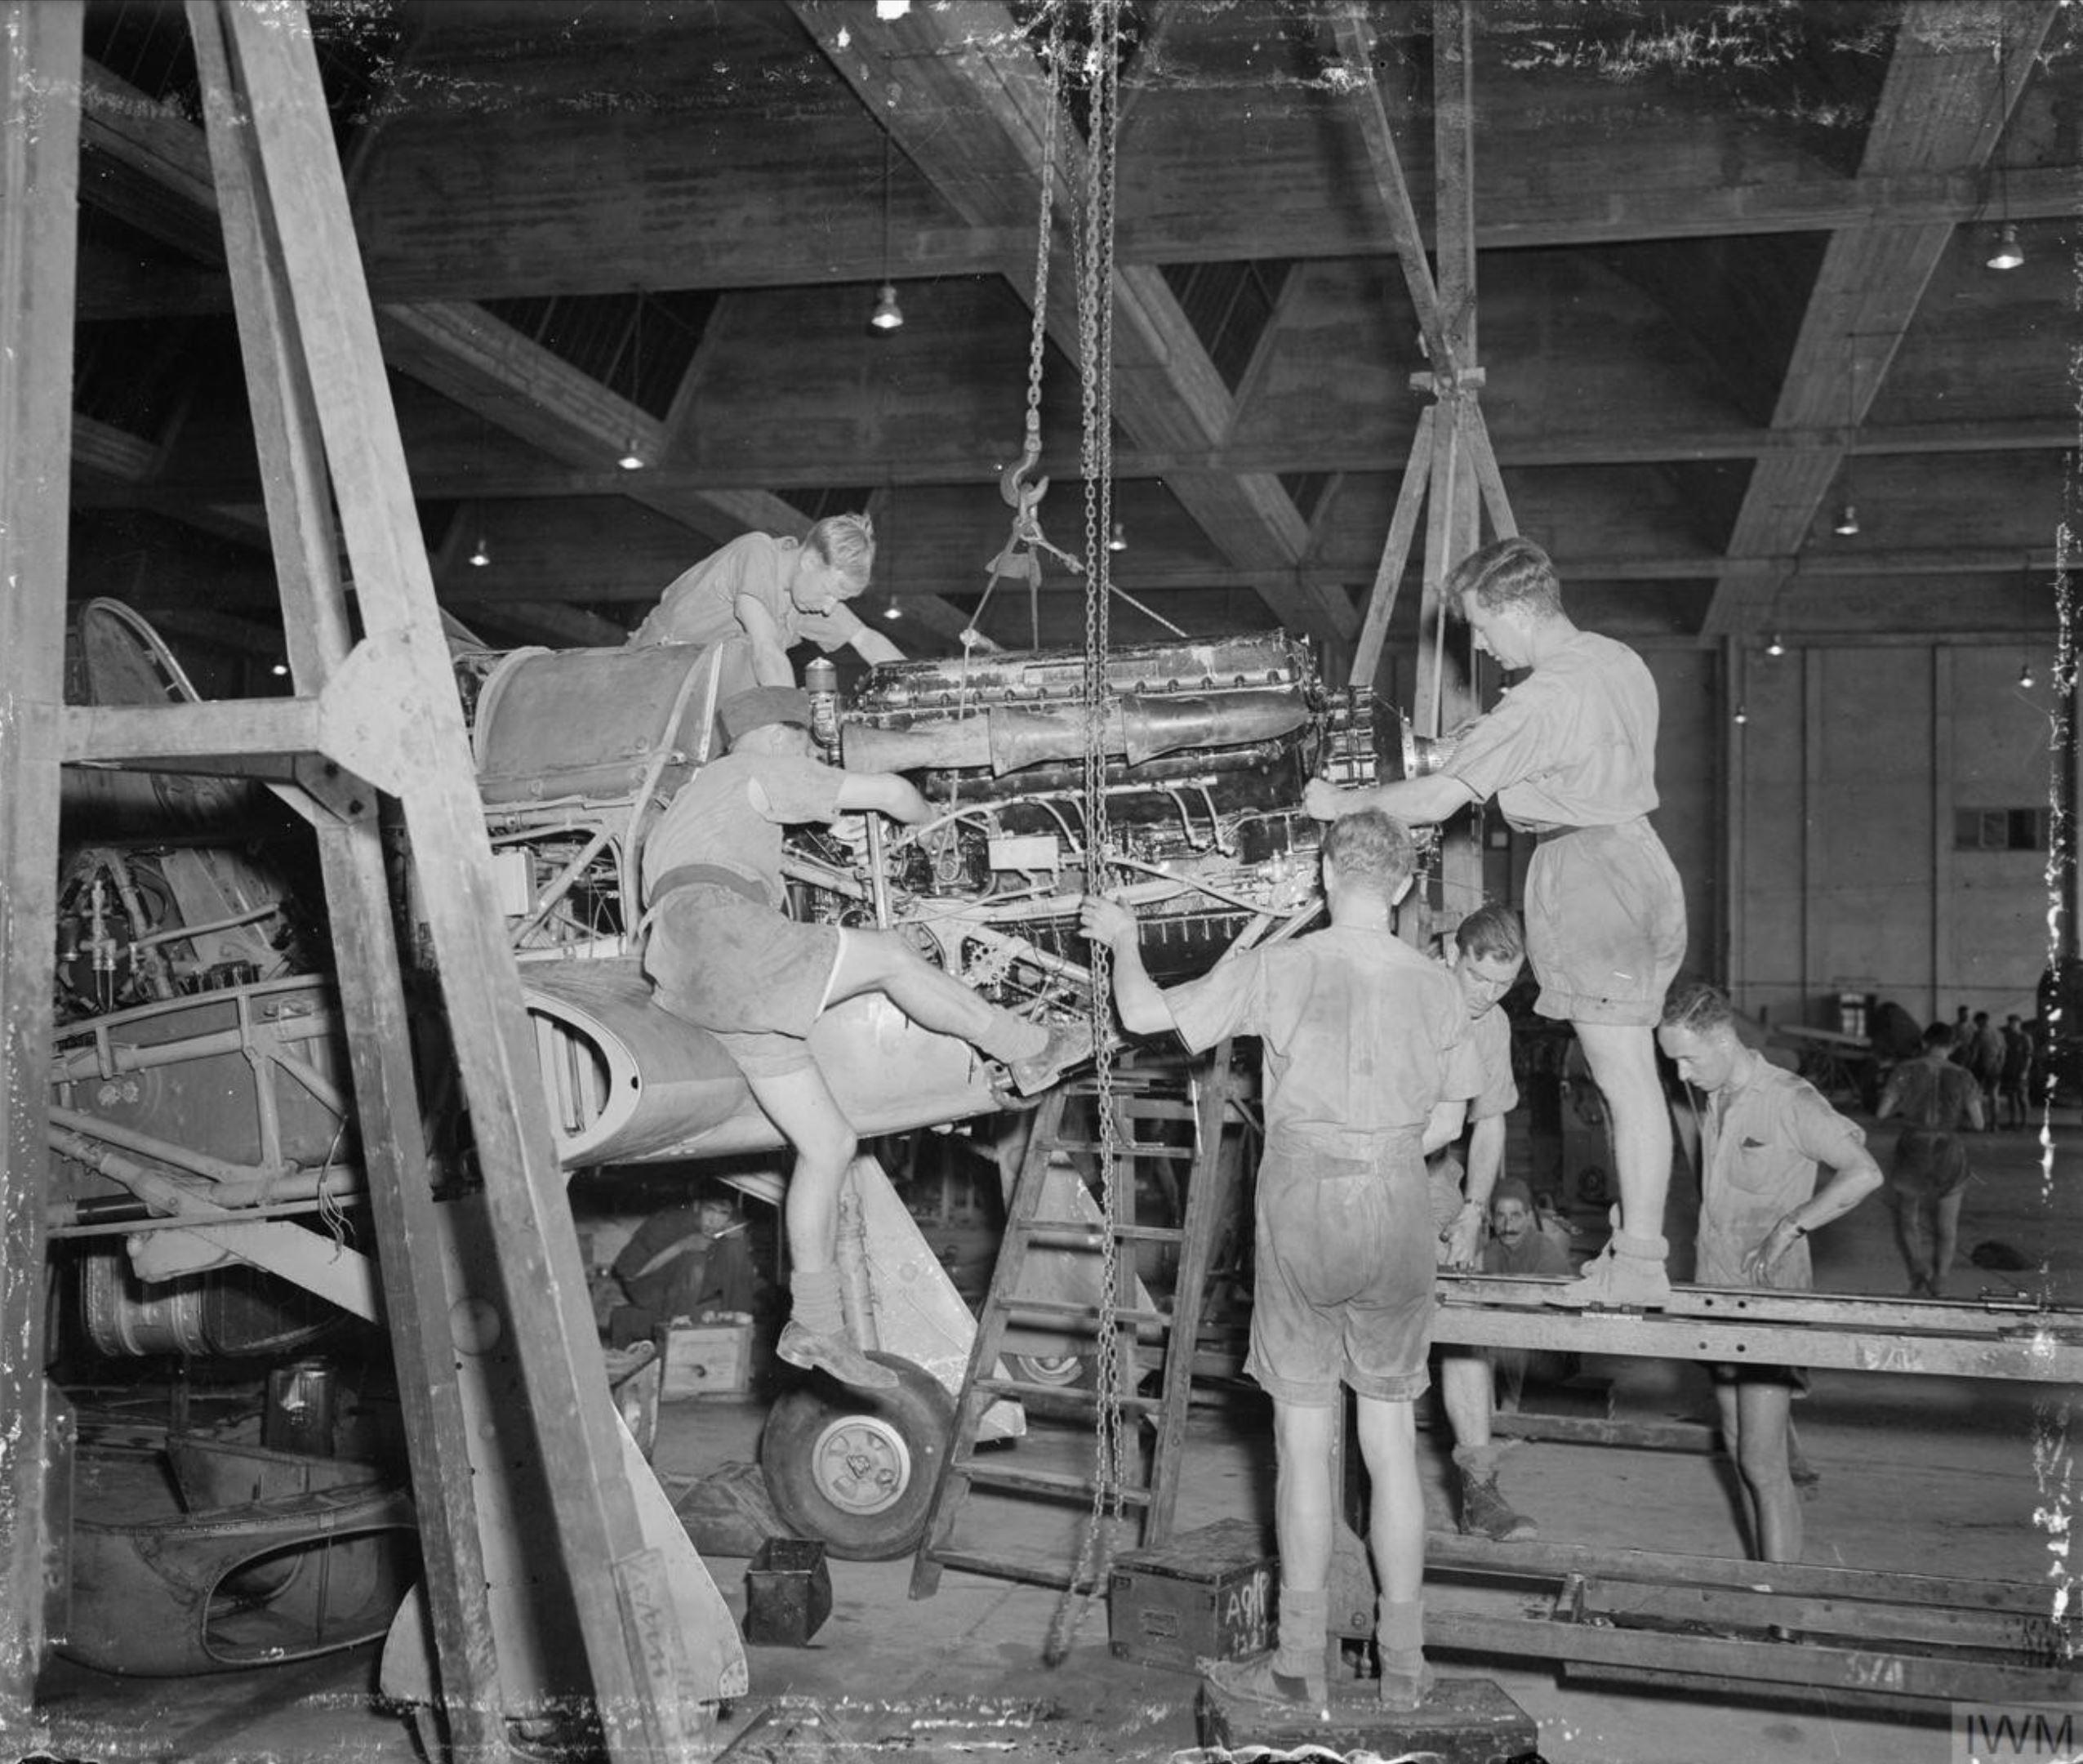 Hurricane RAF 144 Maintenance Unit at Maison Blanche Algeria IWM CNA2251